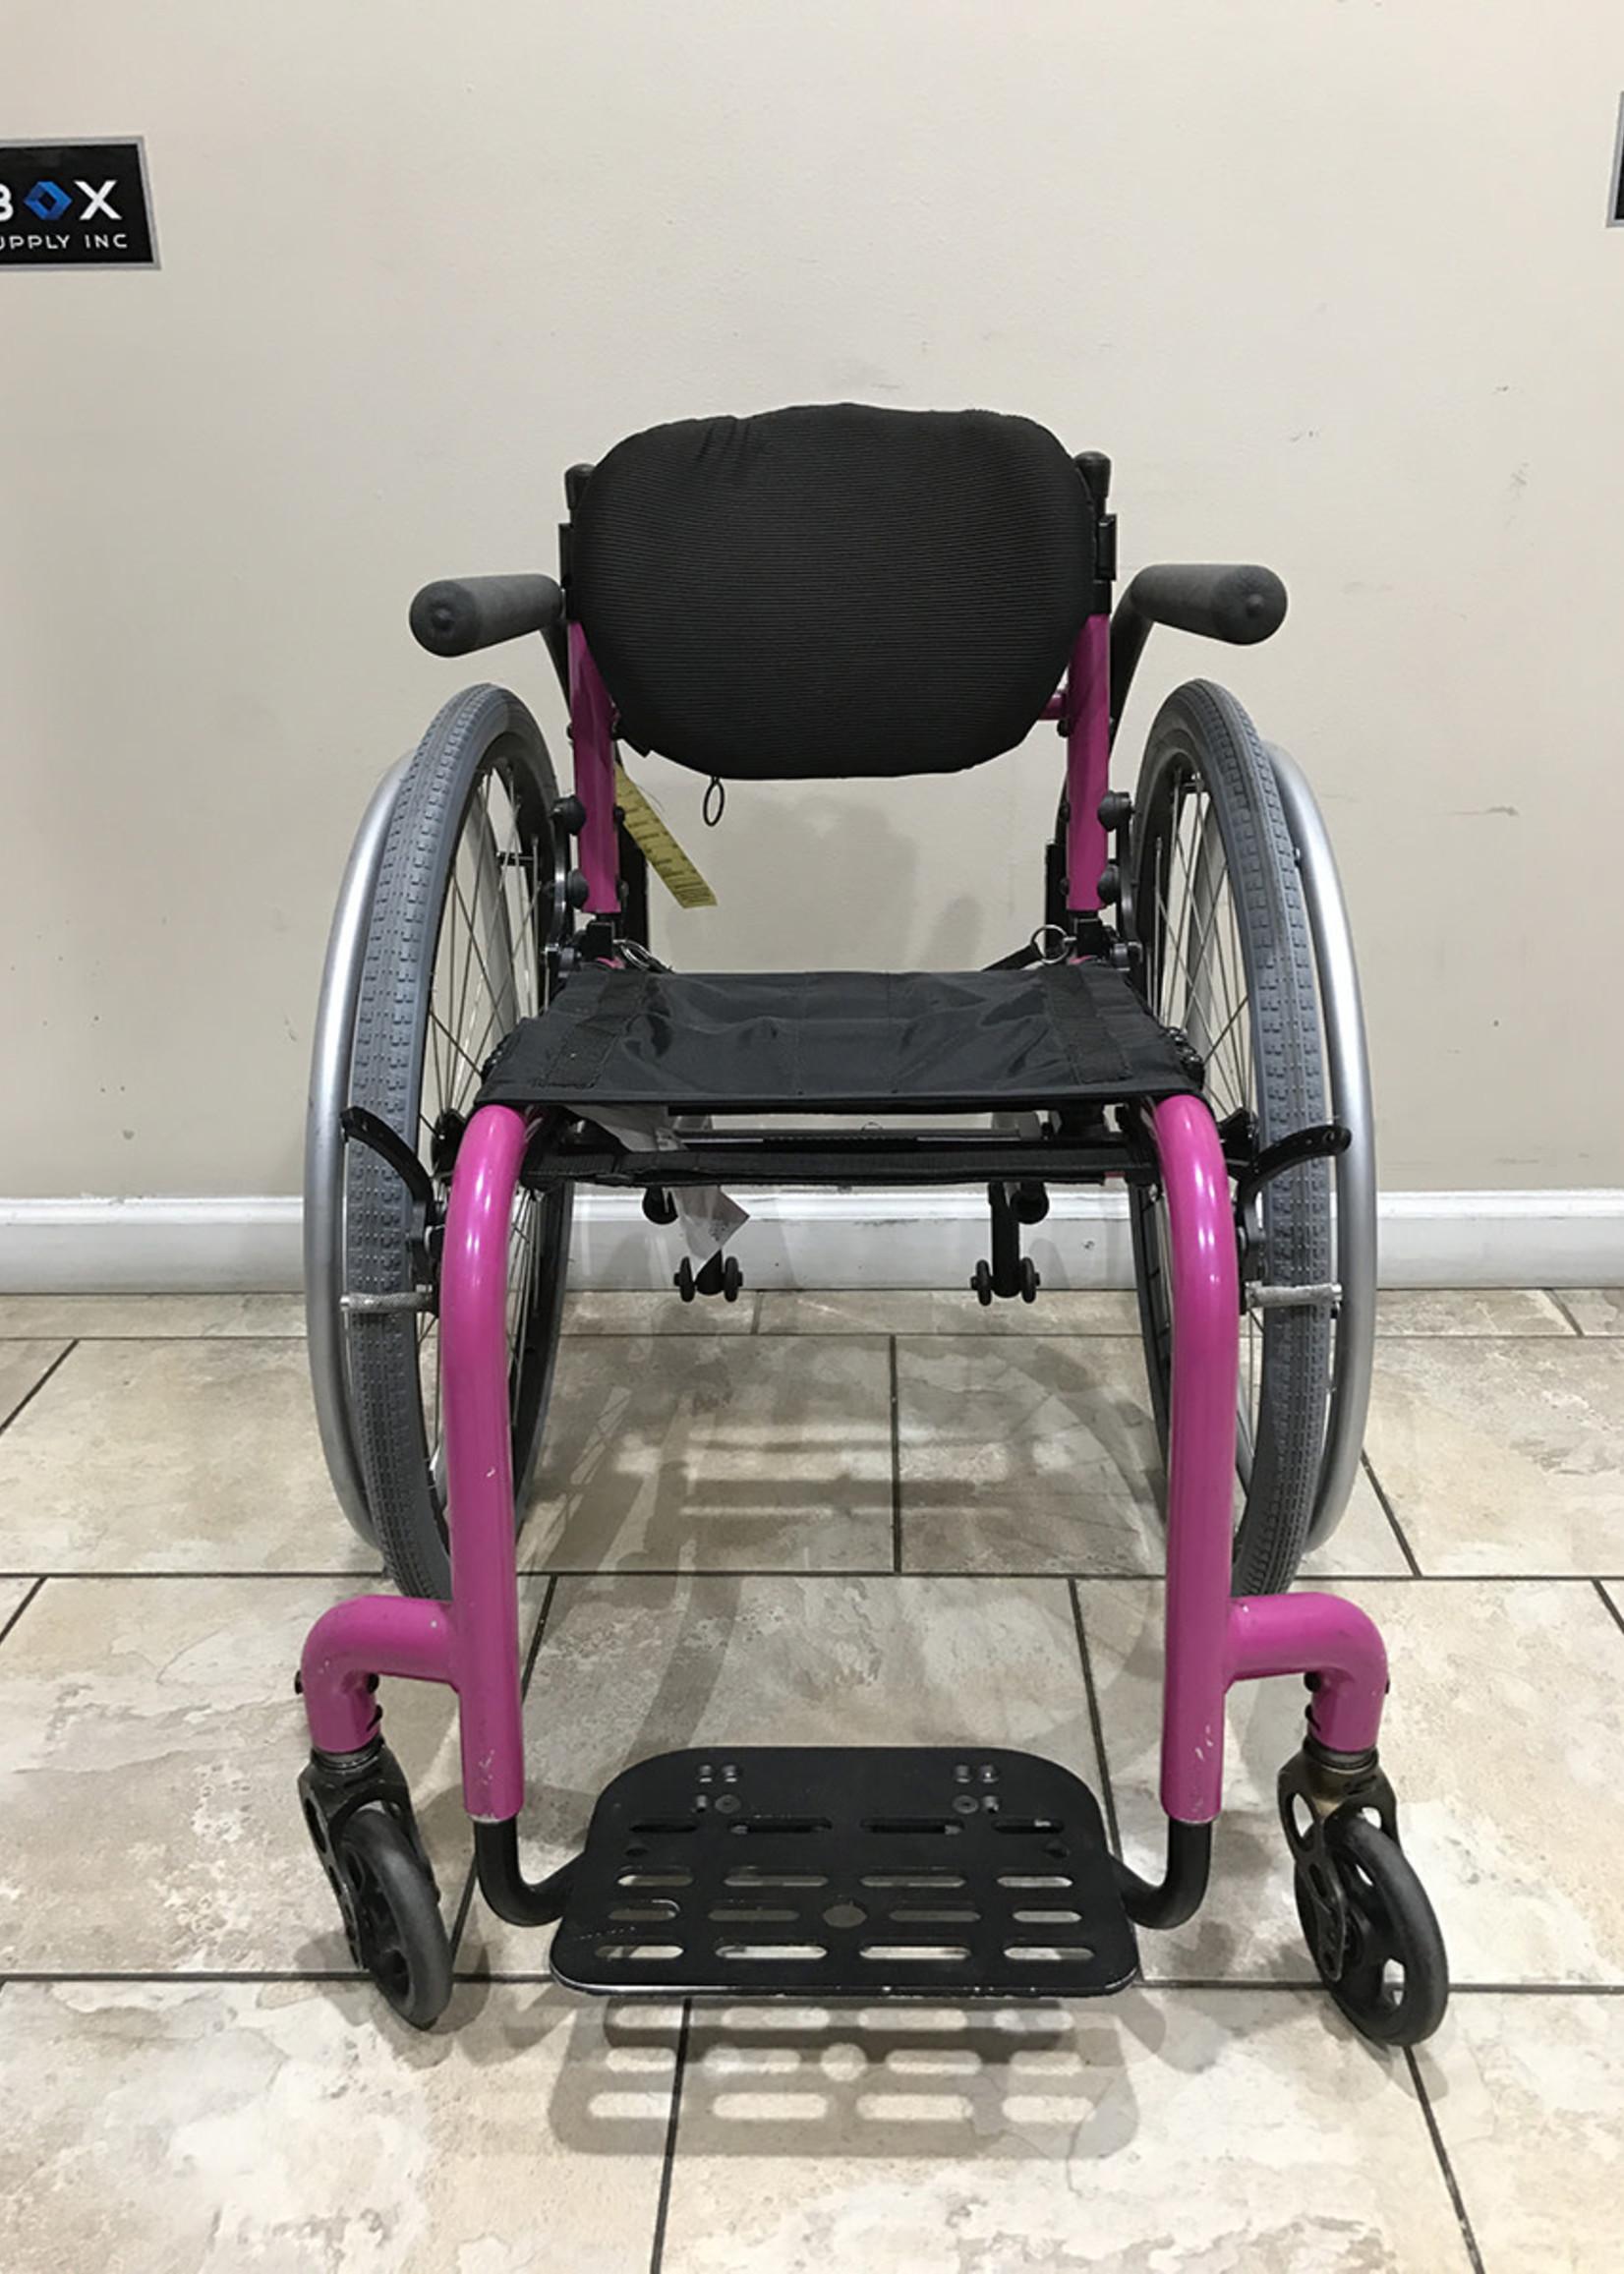 Sunrise Medical Zippie Zone Pediatric Rigid Manual Wheelchair (Used)